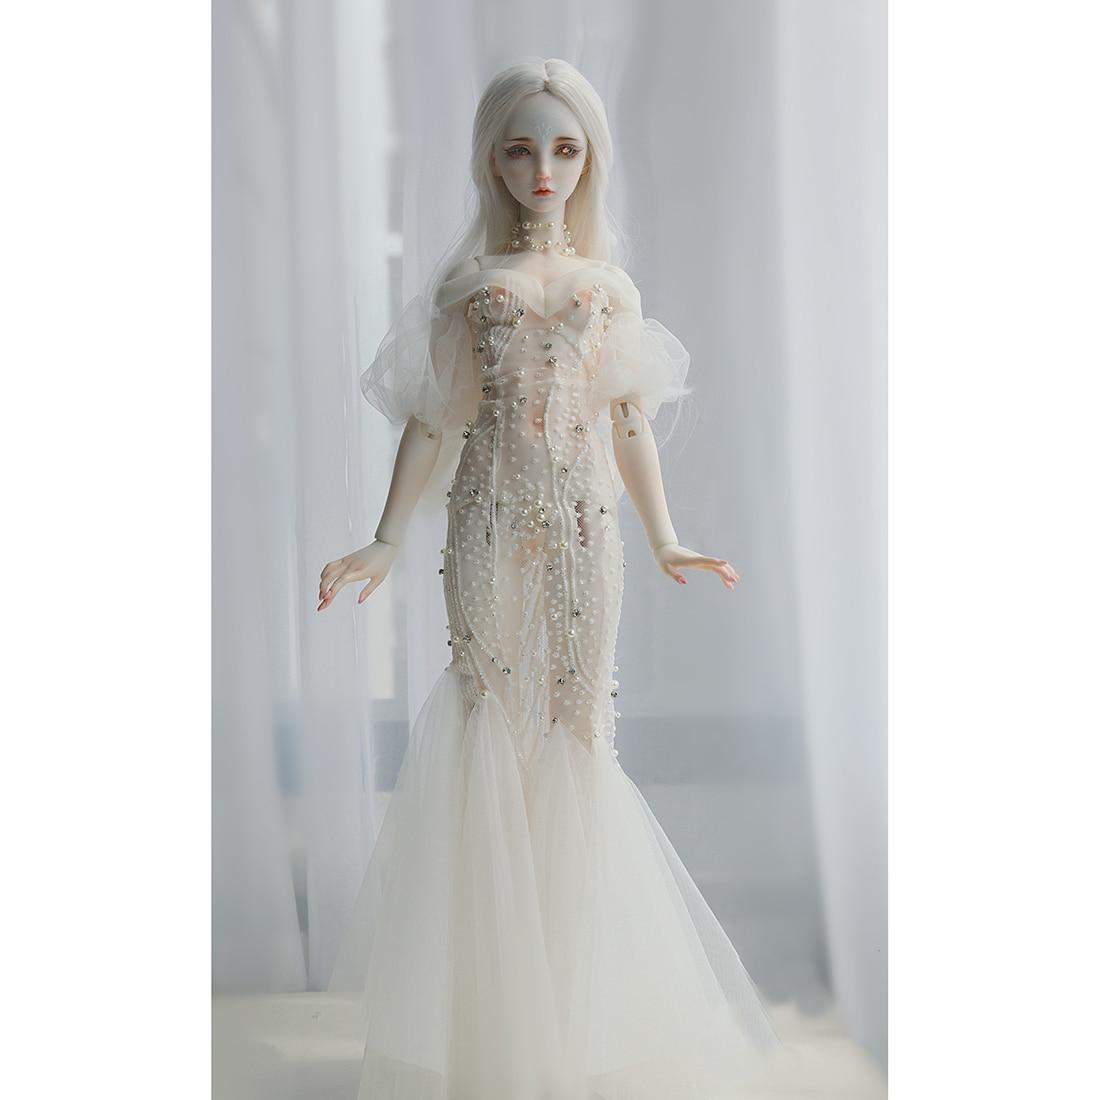 Wedding Dress Clothes Doll Accessories For 1/3 1/4 1/6 BJD Dolls - Transparent No Doll